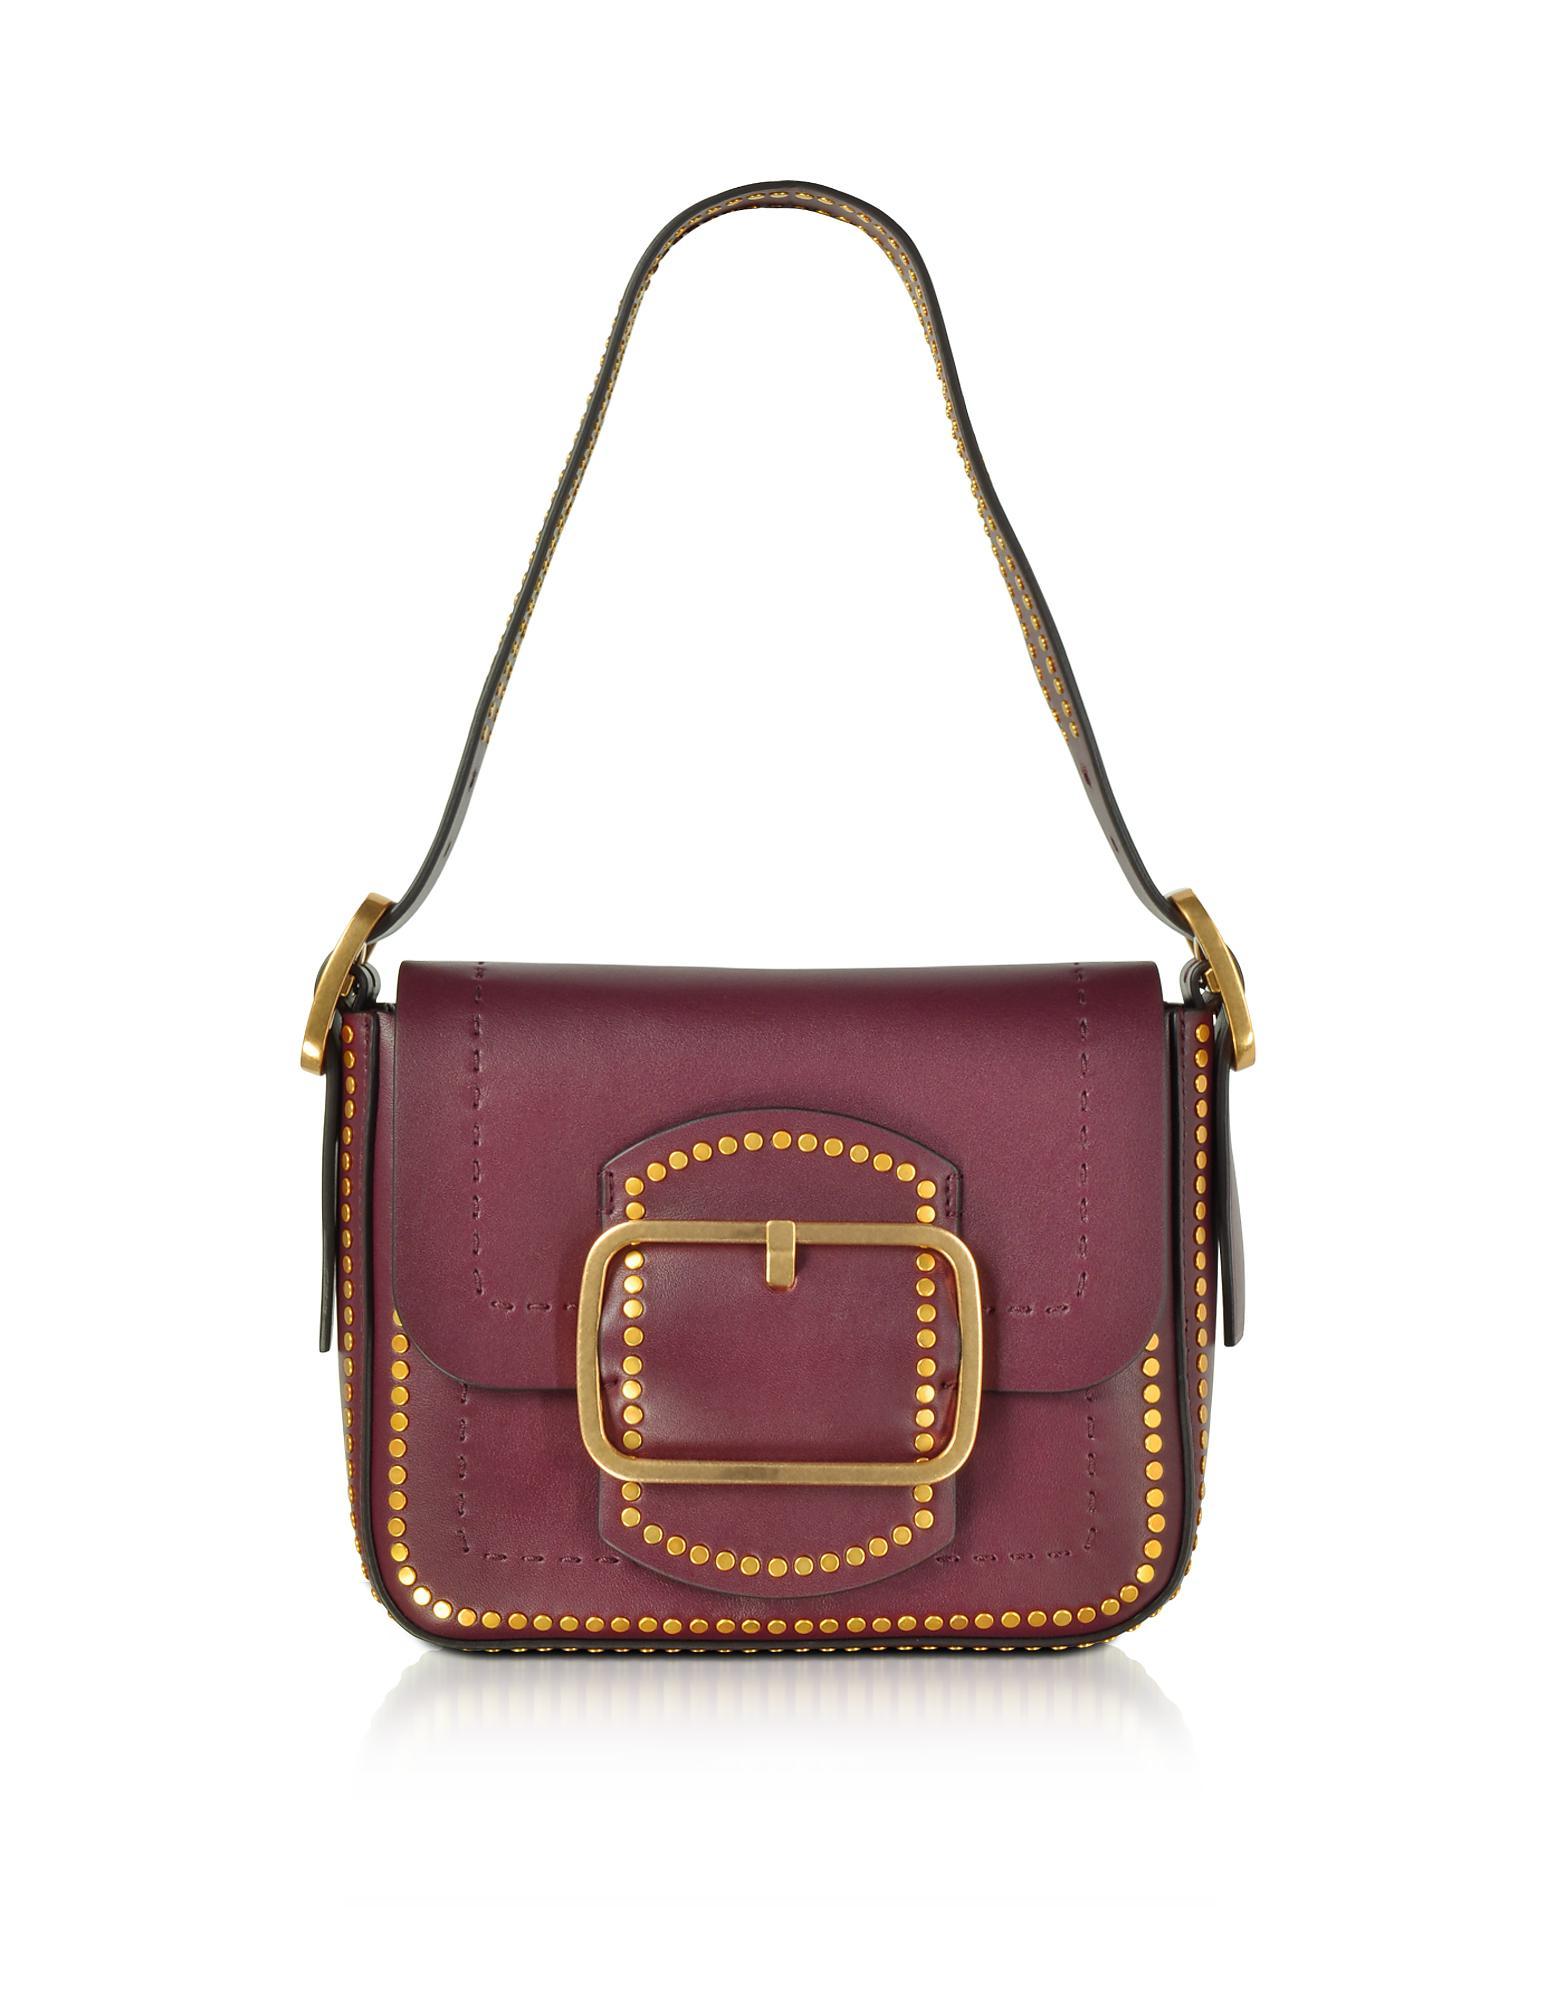 2707b2b9e246 Tory Burch Sawyer Port Stud Leather Small Shoulder Bag in Purple - Lyst